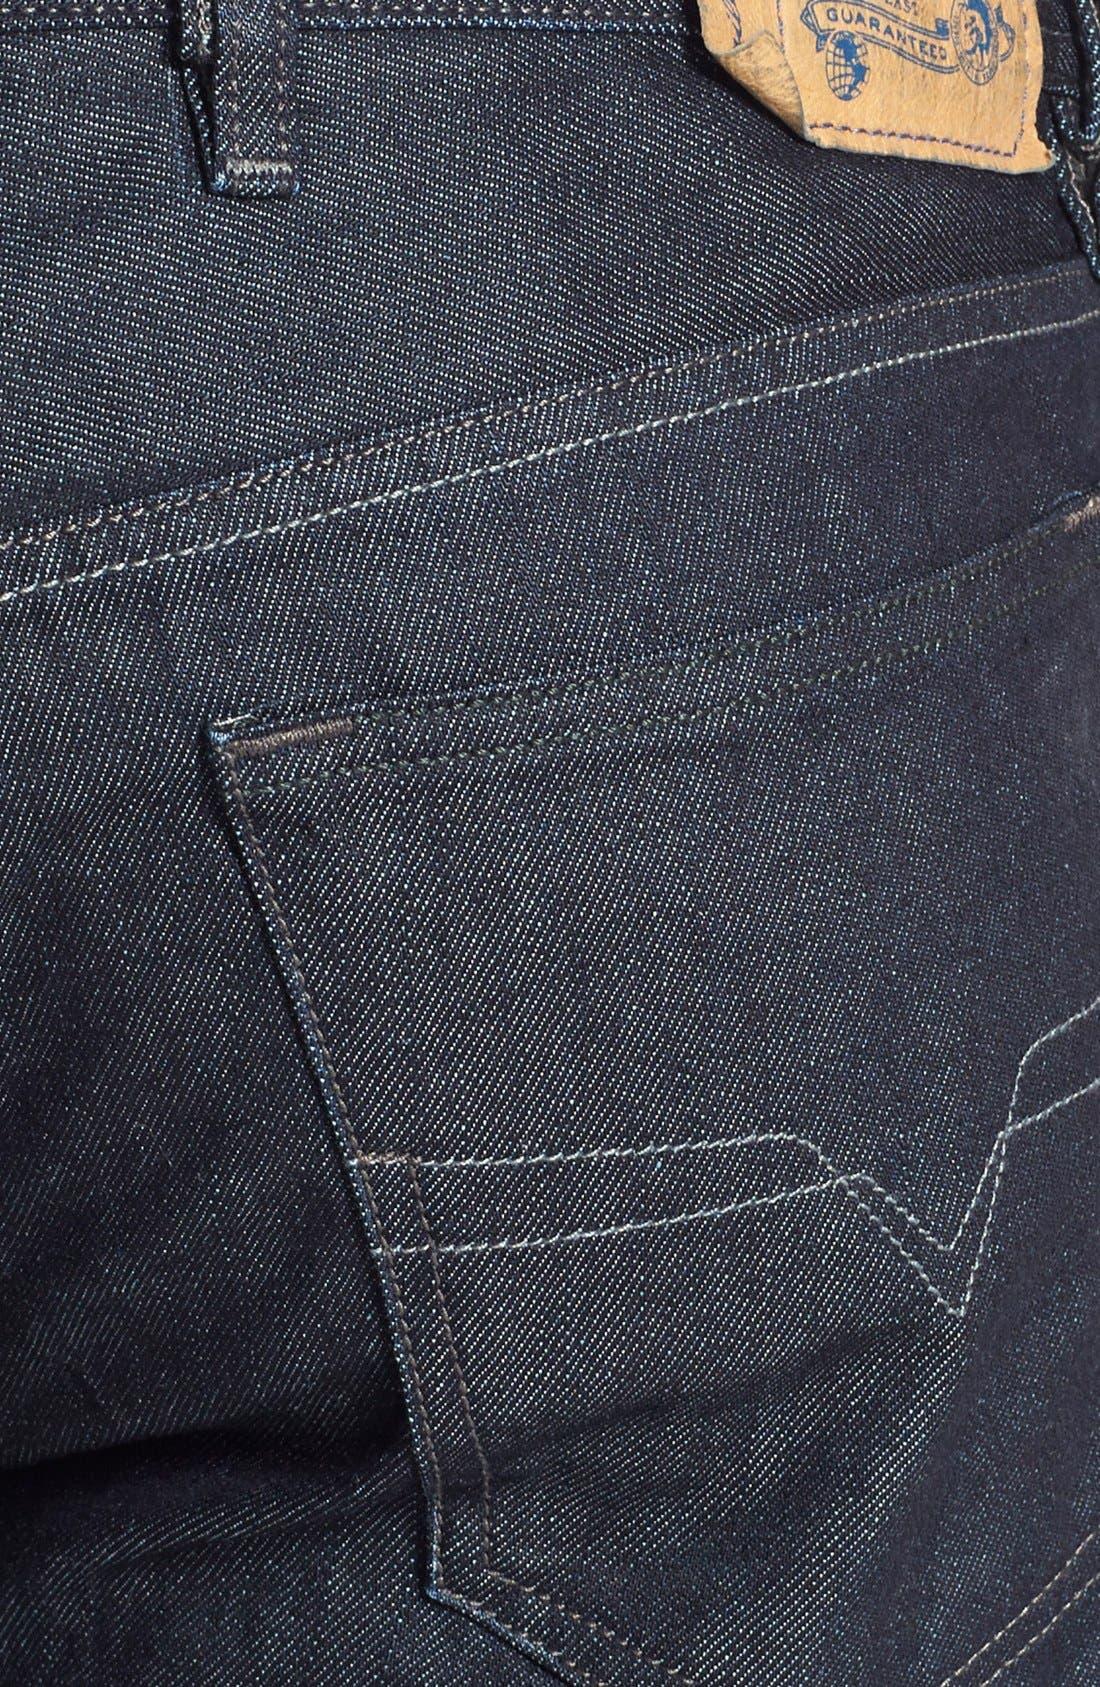 Waykee Straight Leg Jeans,                             Alternate thumbnail 4, color,                             0Z88